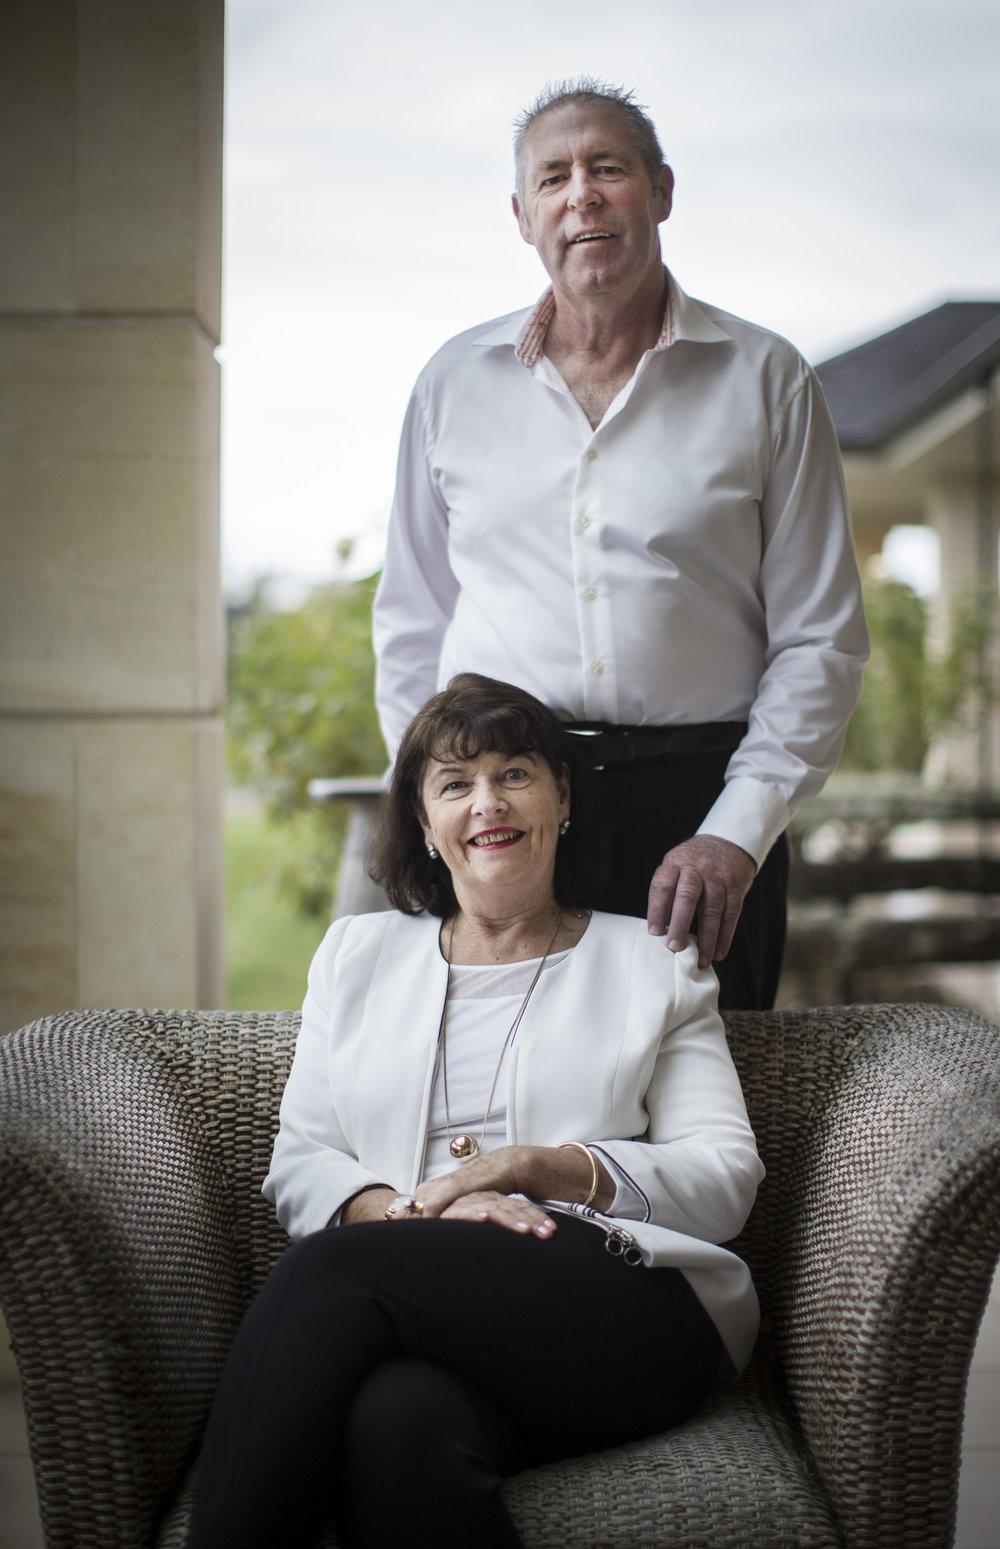 About Us_2018_Bernie & Kaye Crosby.jpg